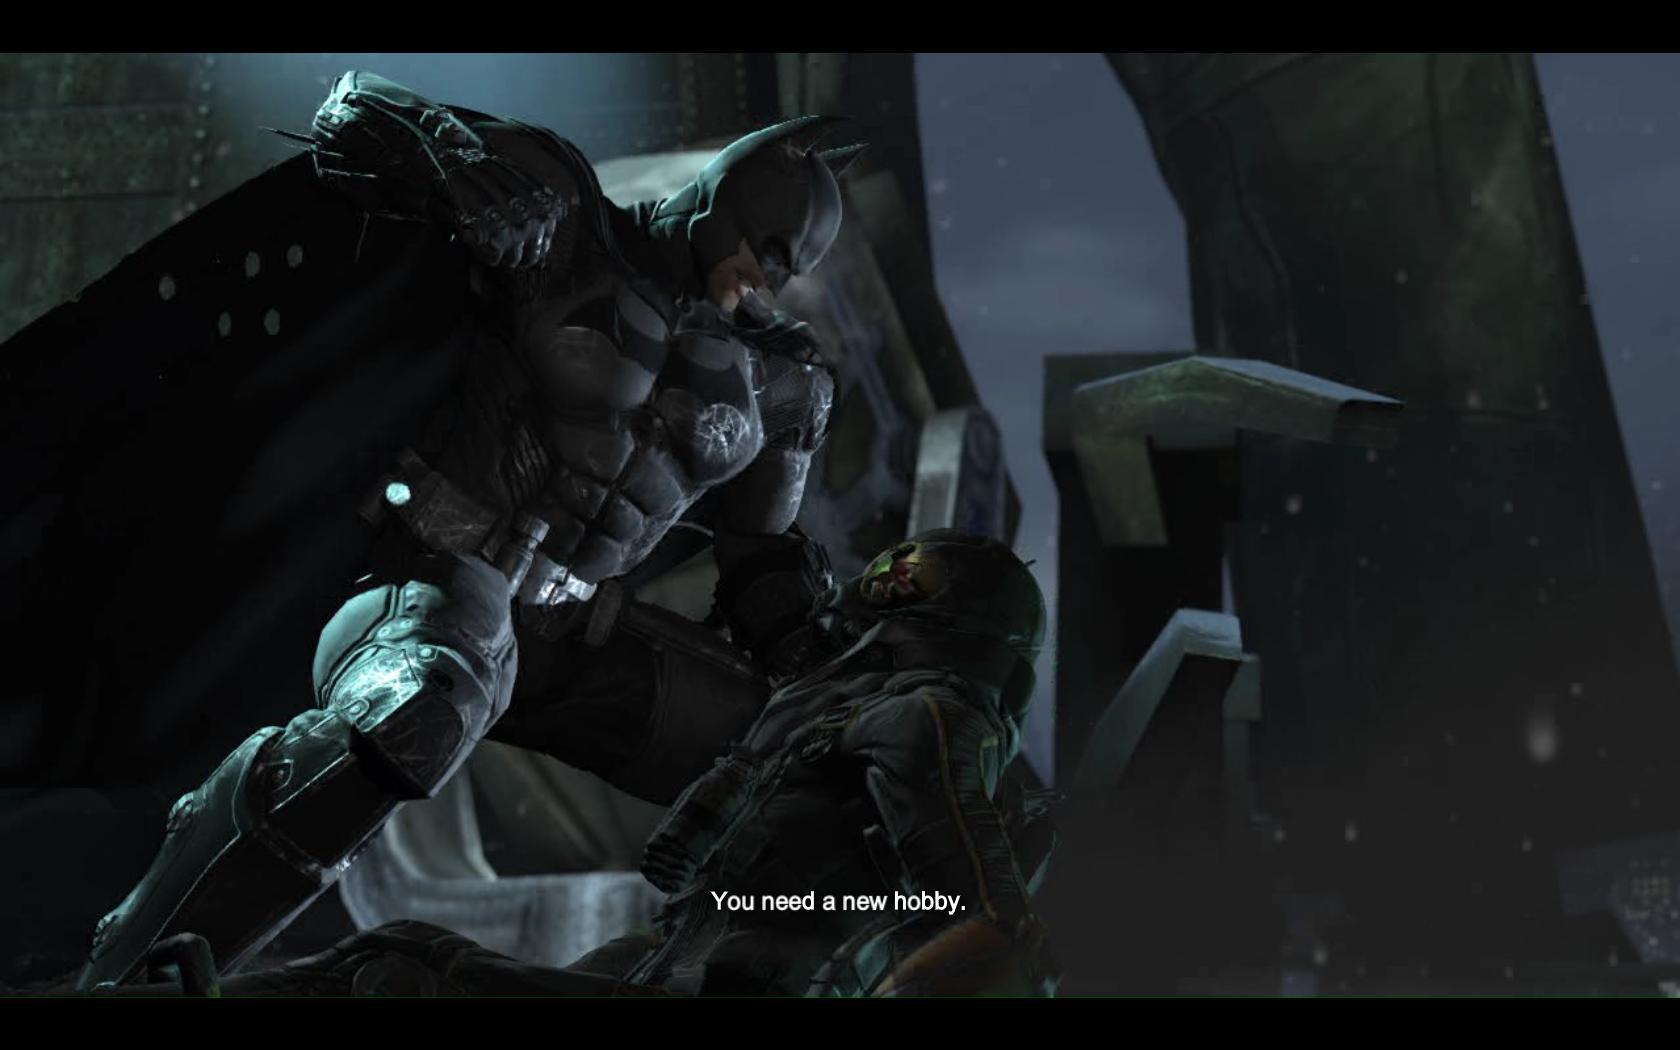 BatmanOrigins 2013-12-14 05-36-04-69.jpg